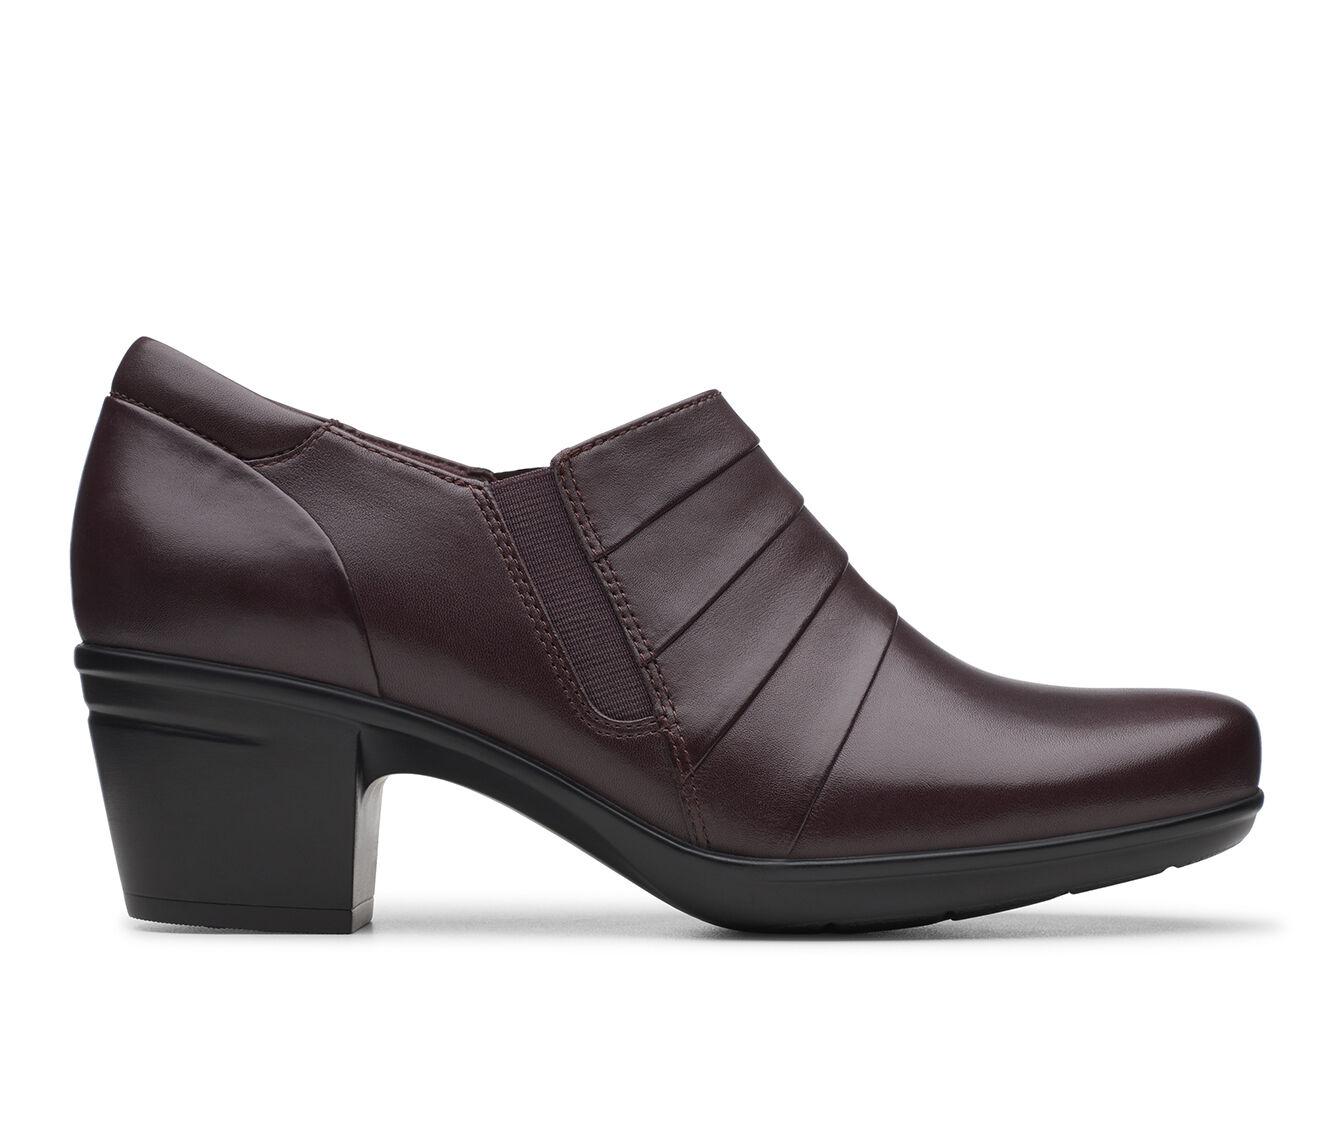 uk shoes_kd5747